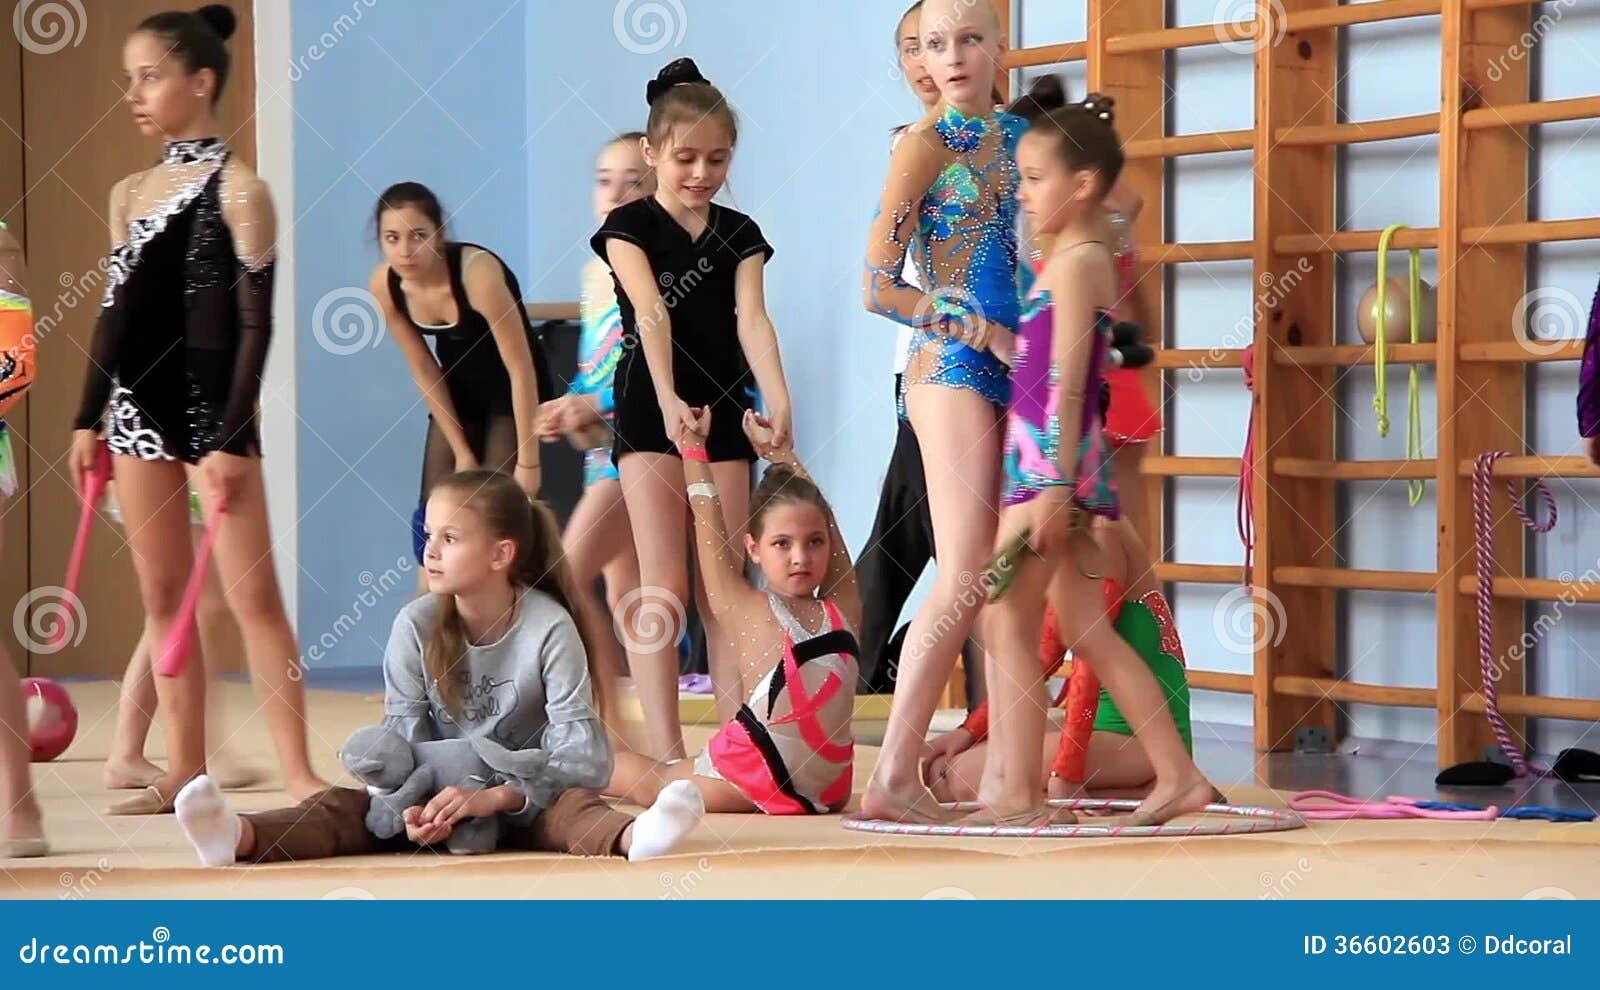 school girl kiev